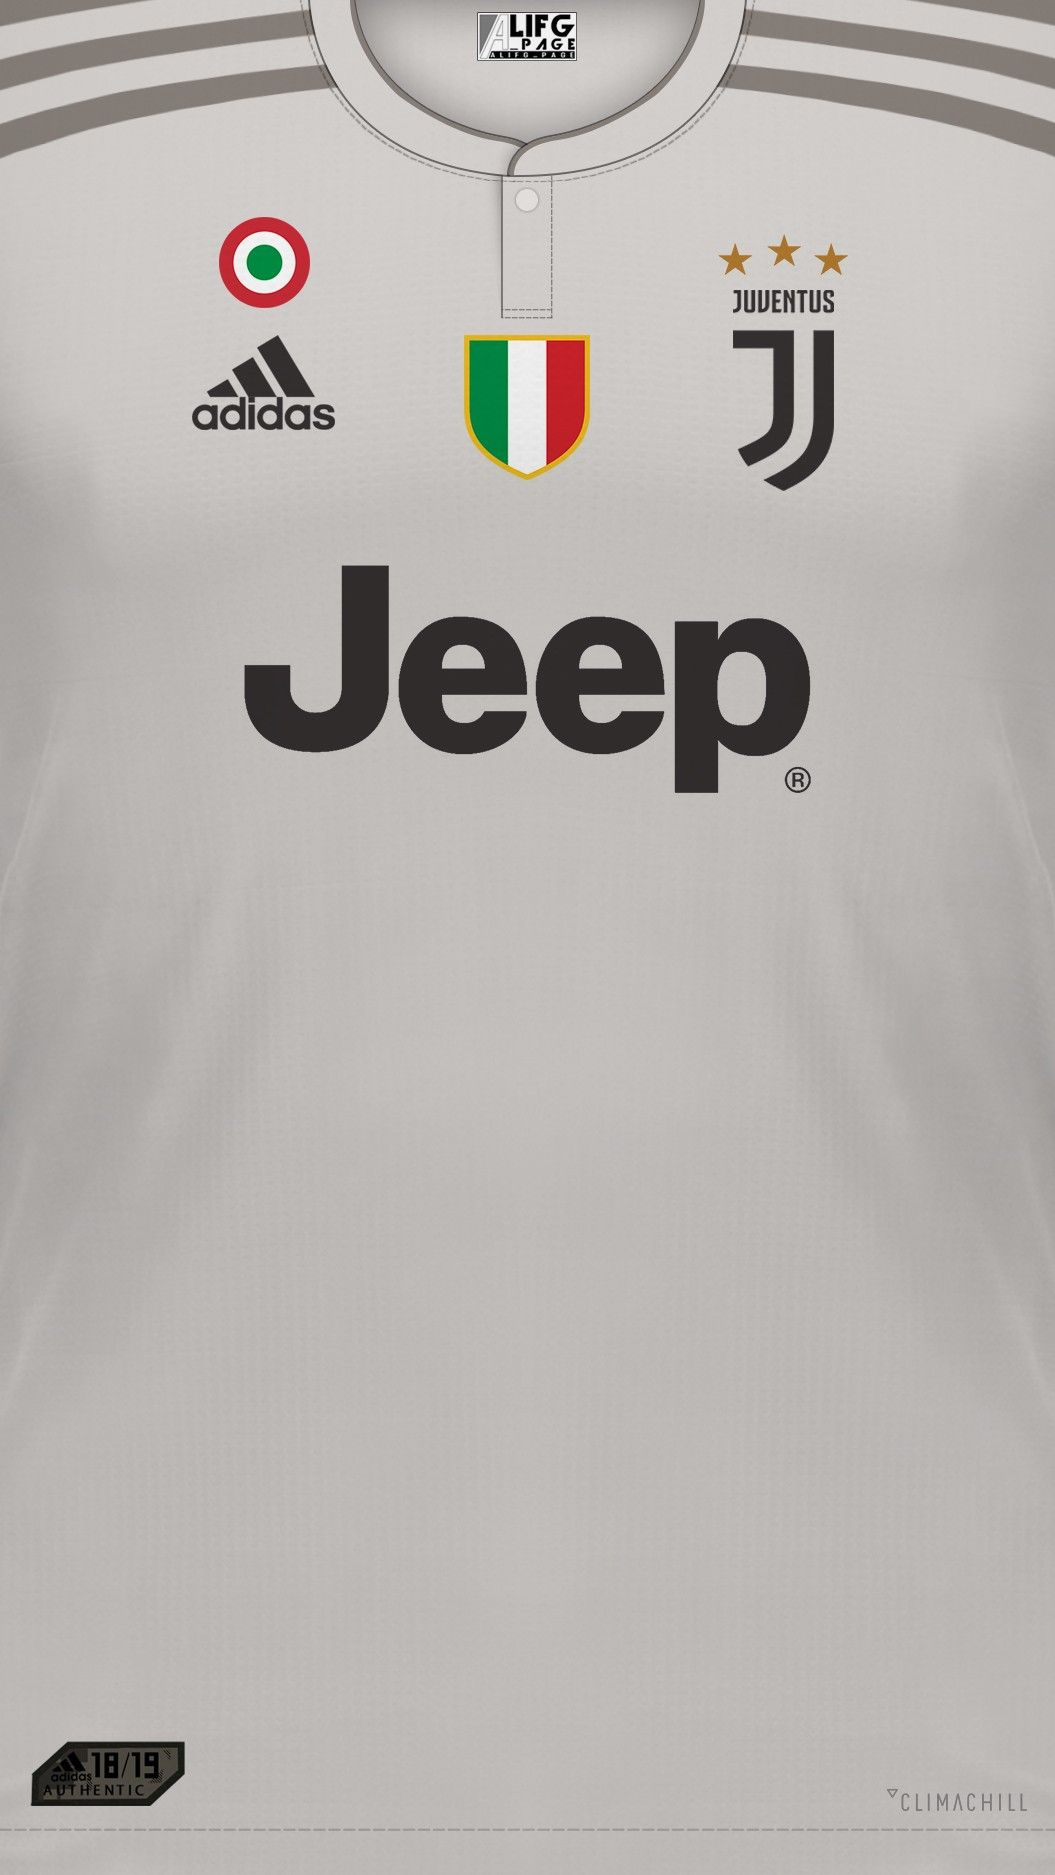 Pin De Miguel Rodriguez Em Kits Para Pes Camisas De Futebol